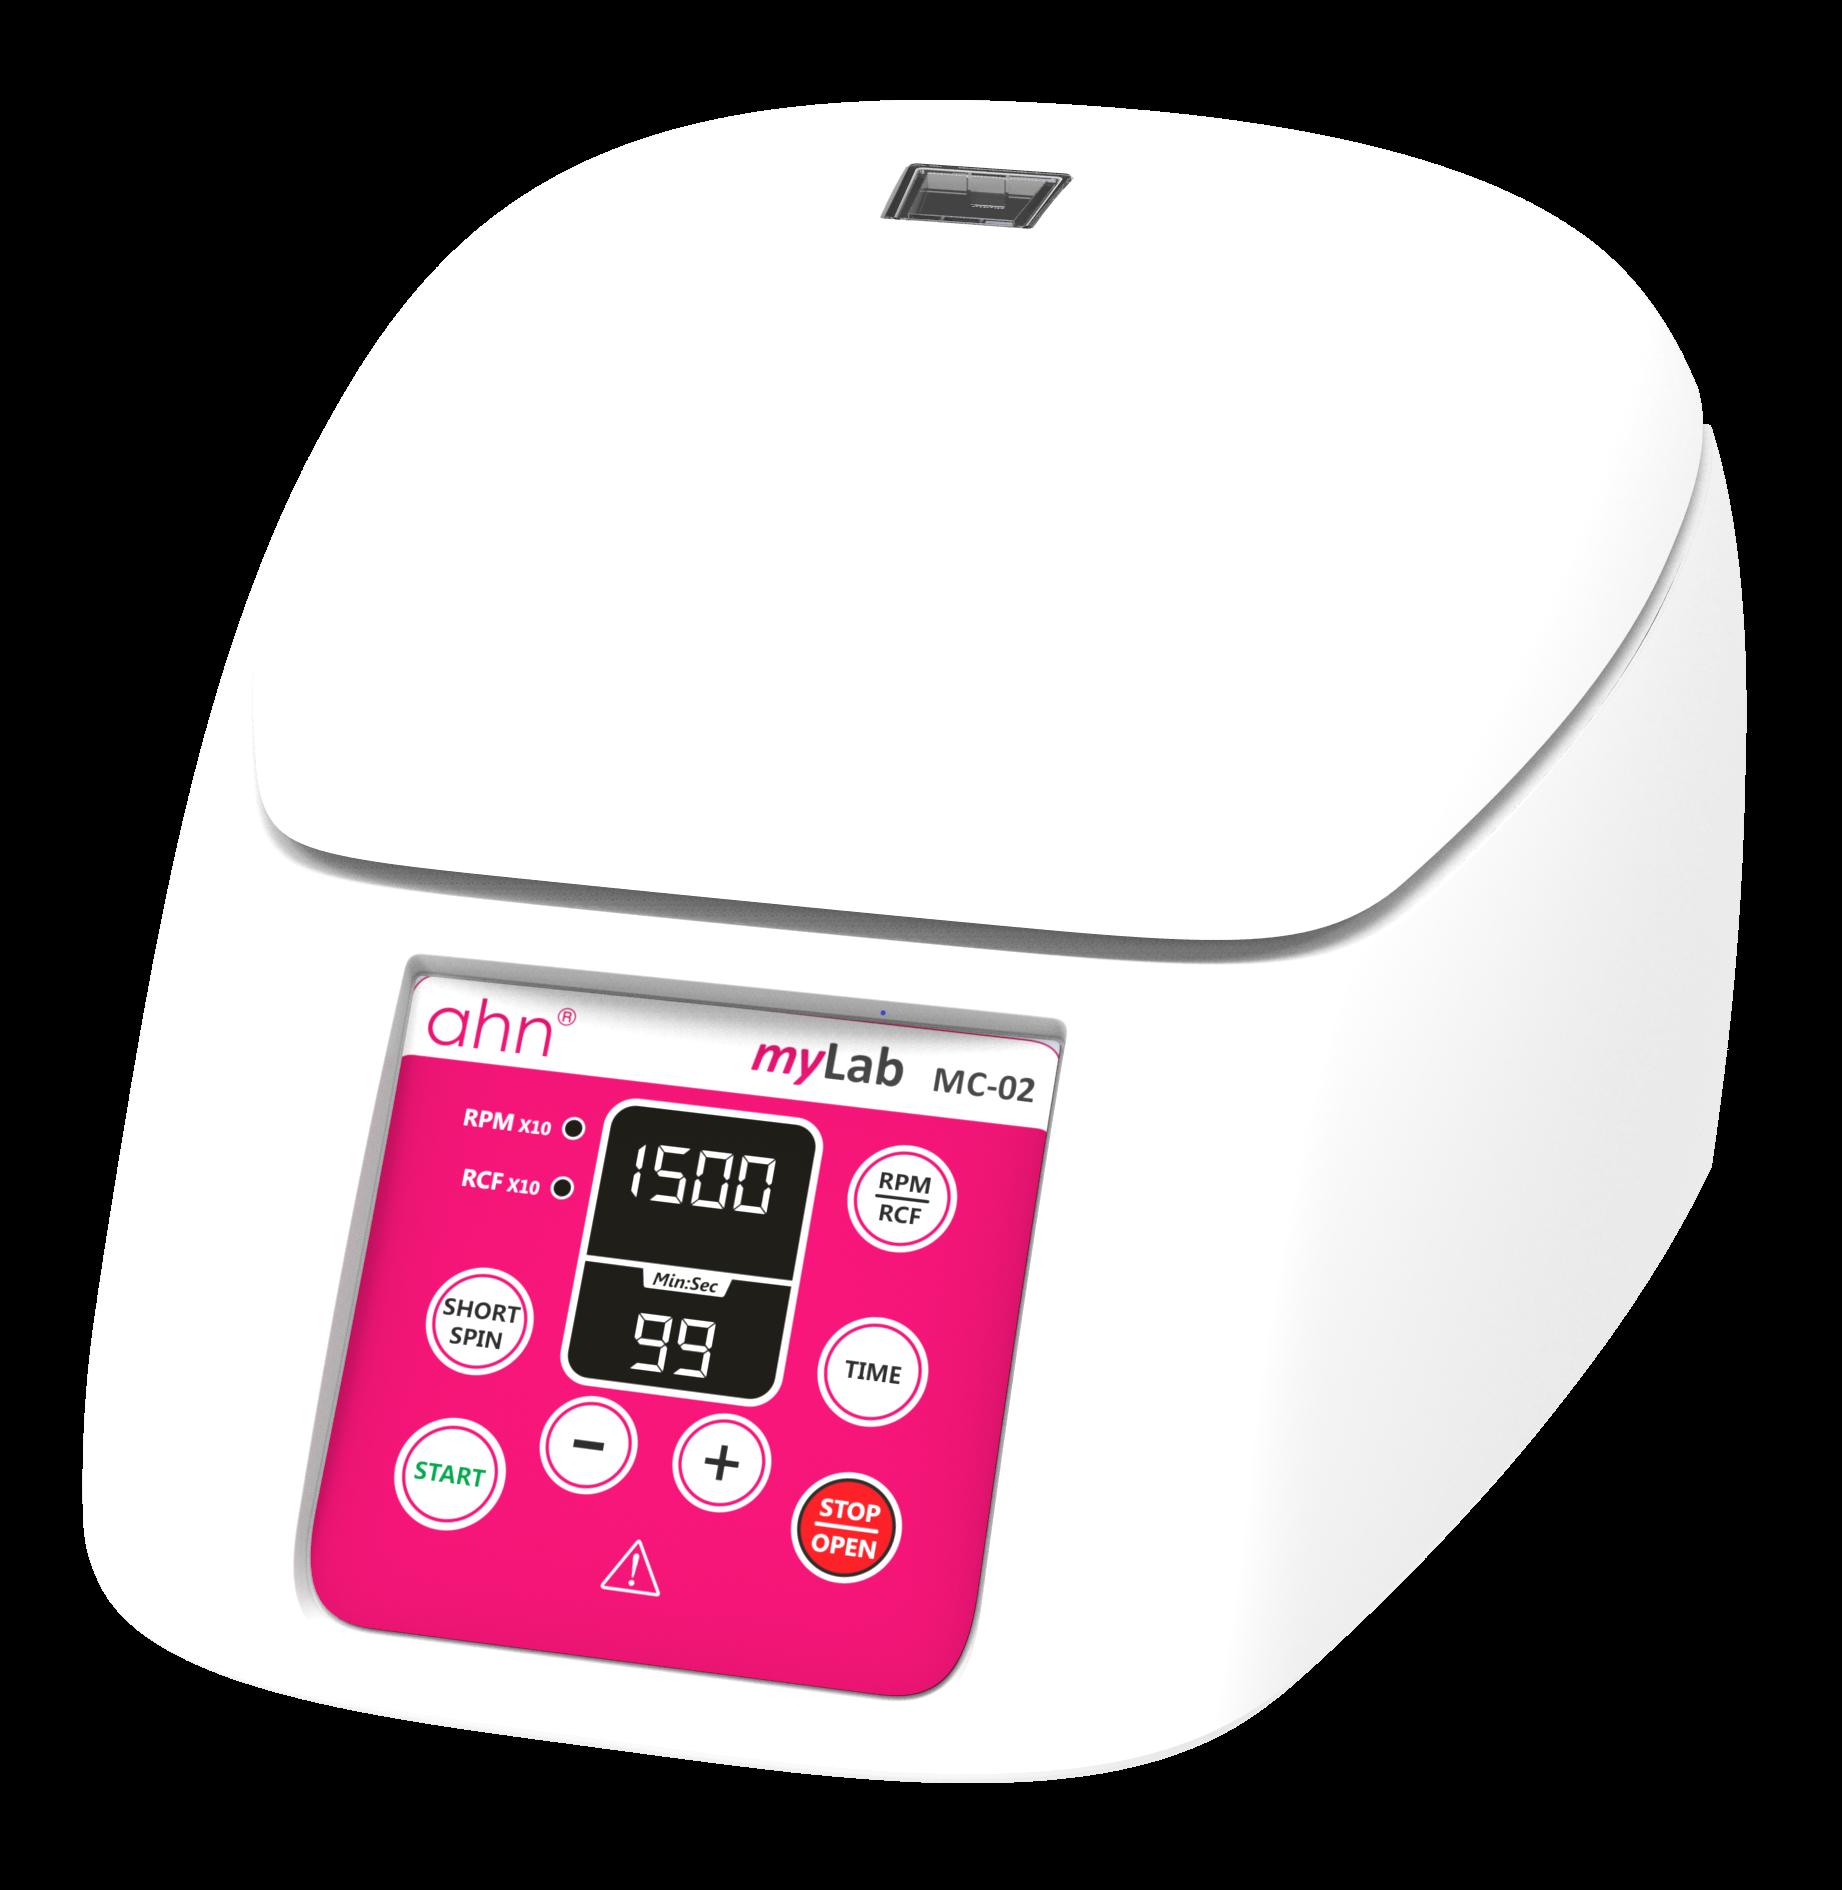 pcr centrifuge, microcentrifuge, small lab centrifuge